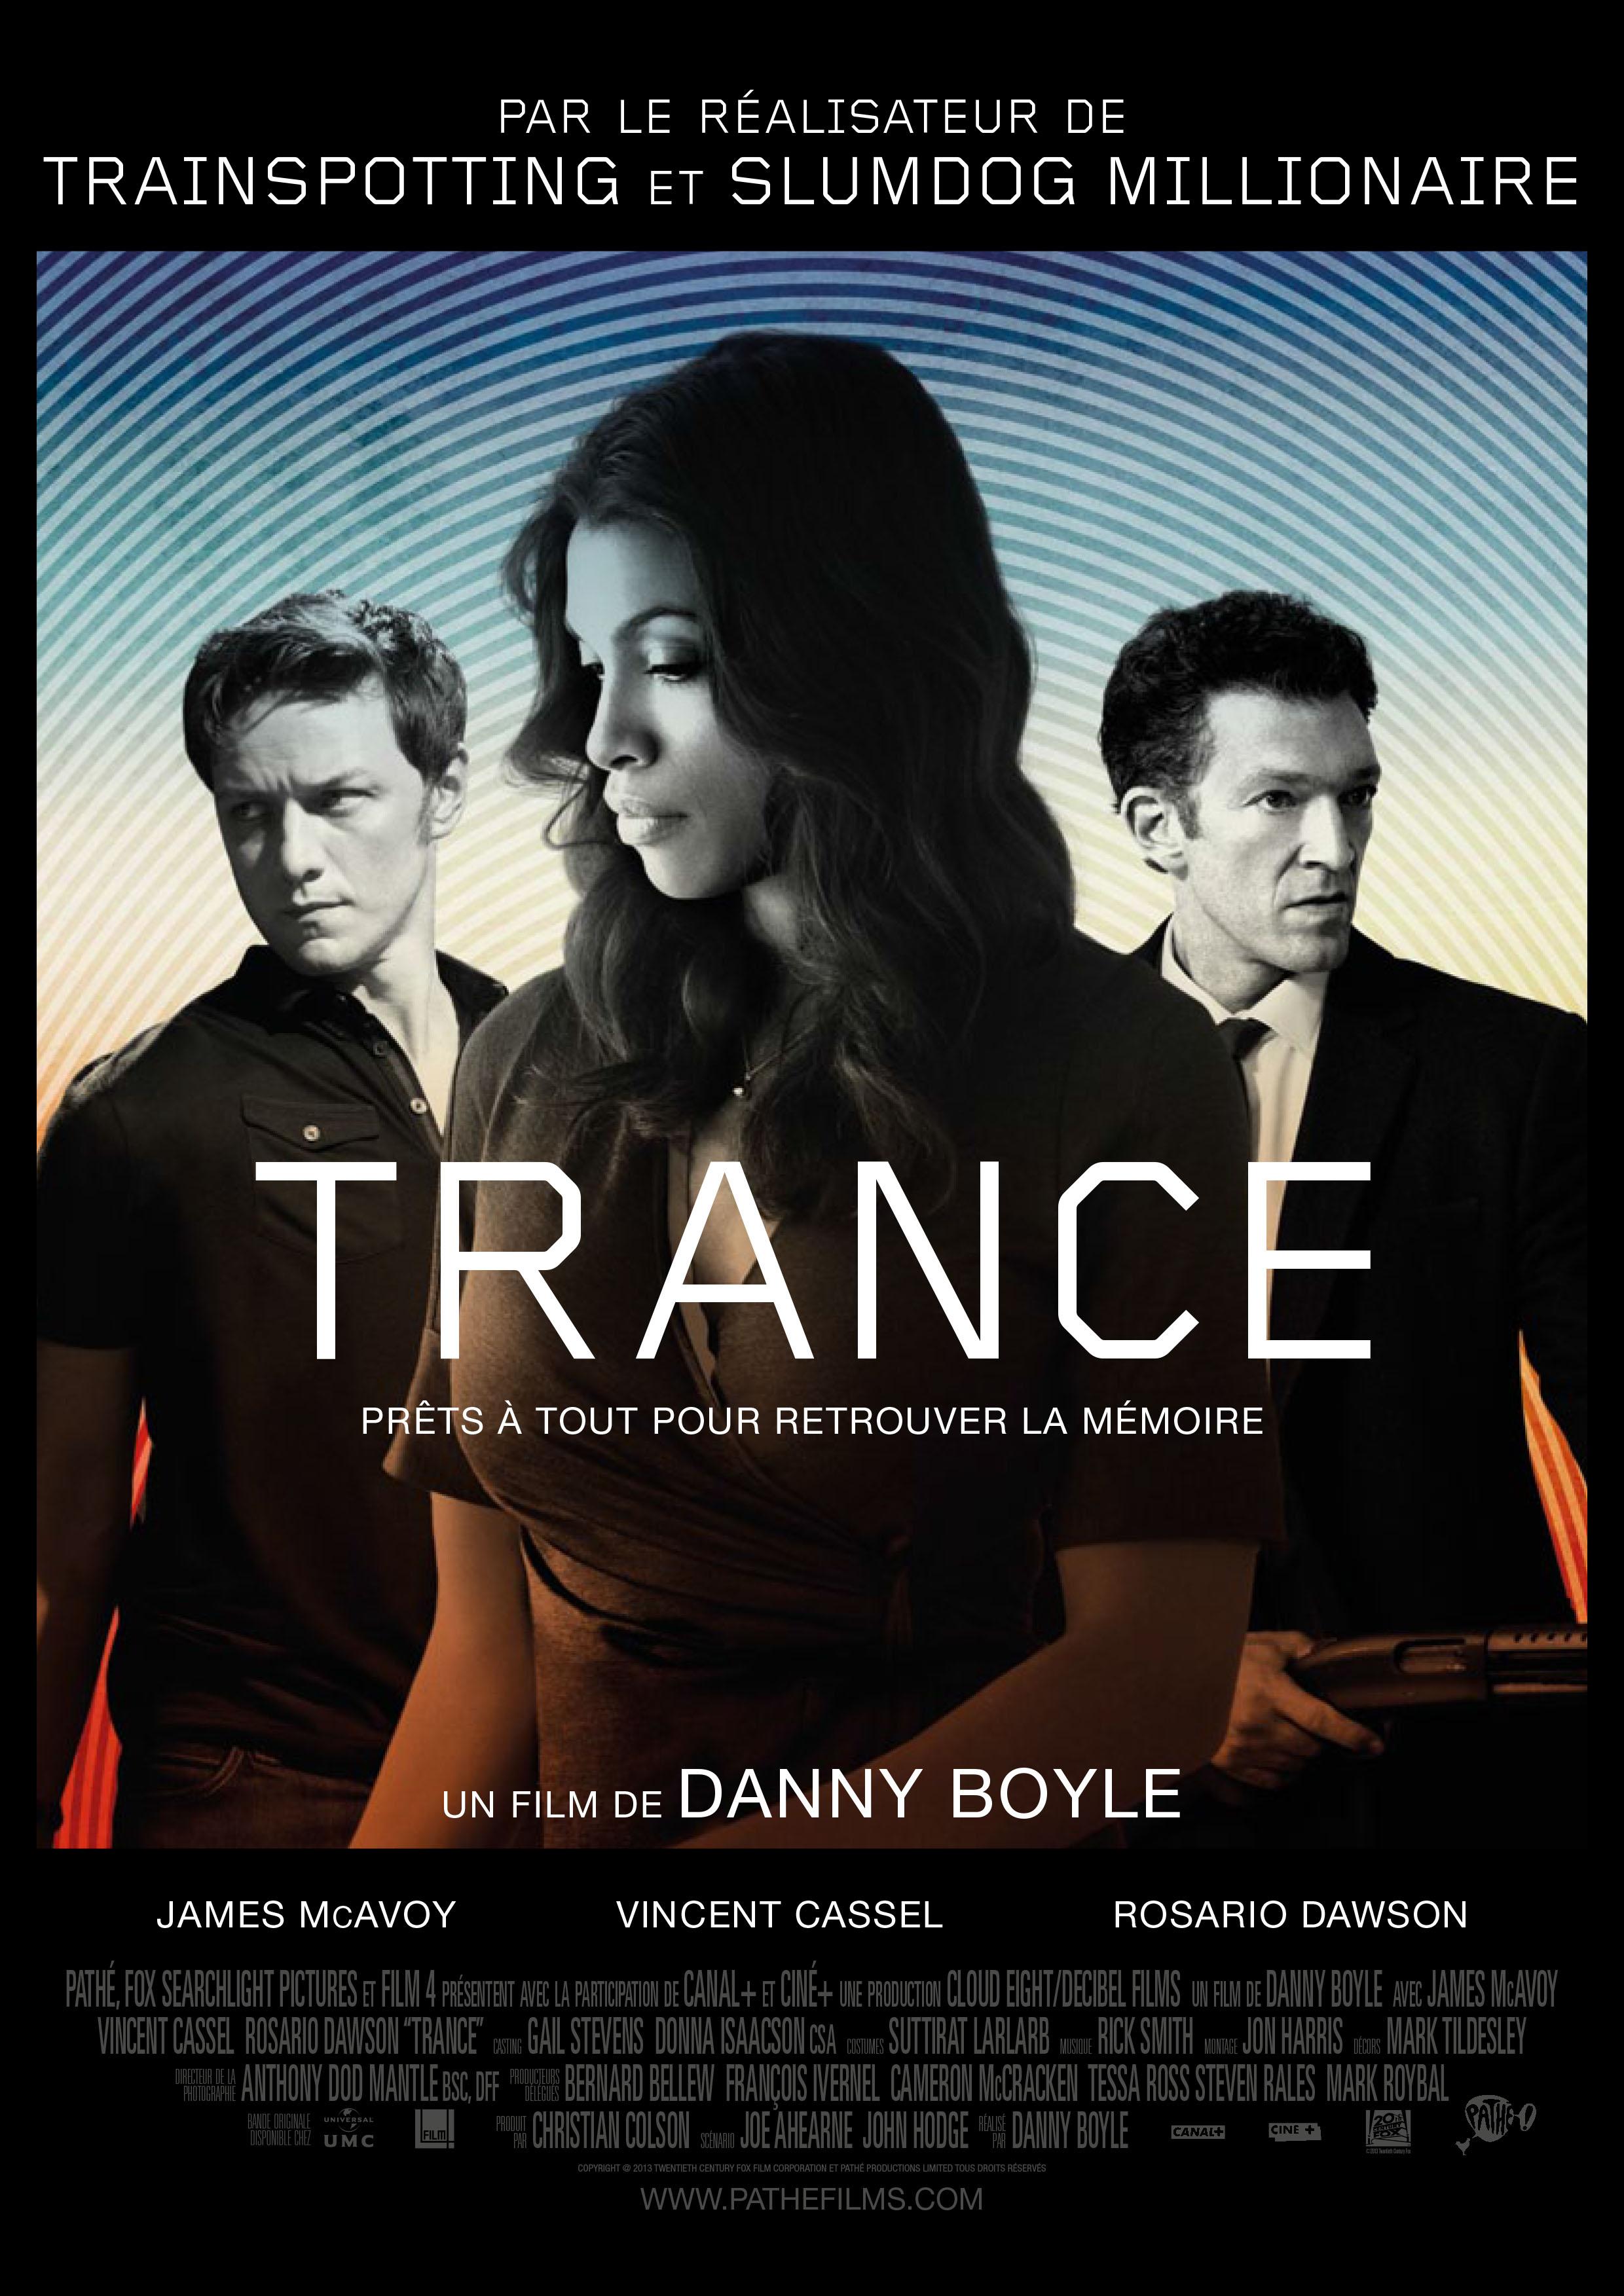 Trance-Affiche-France